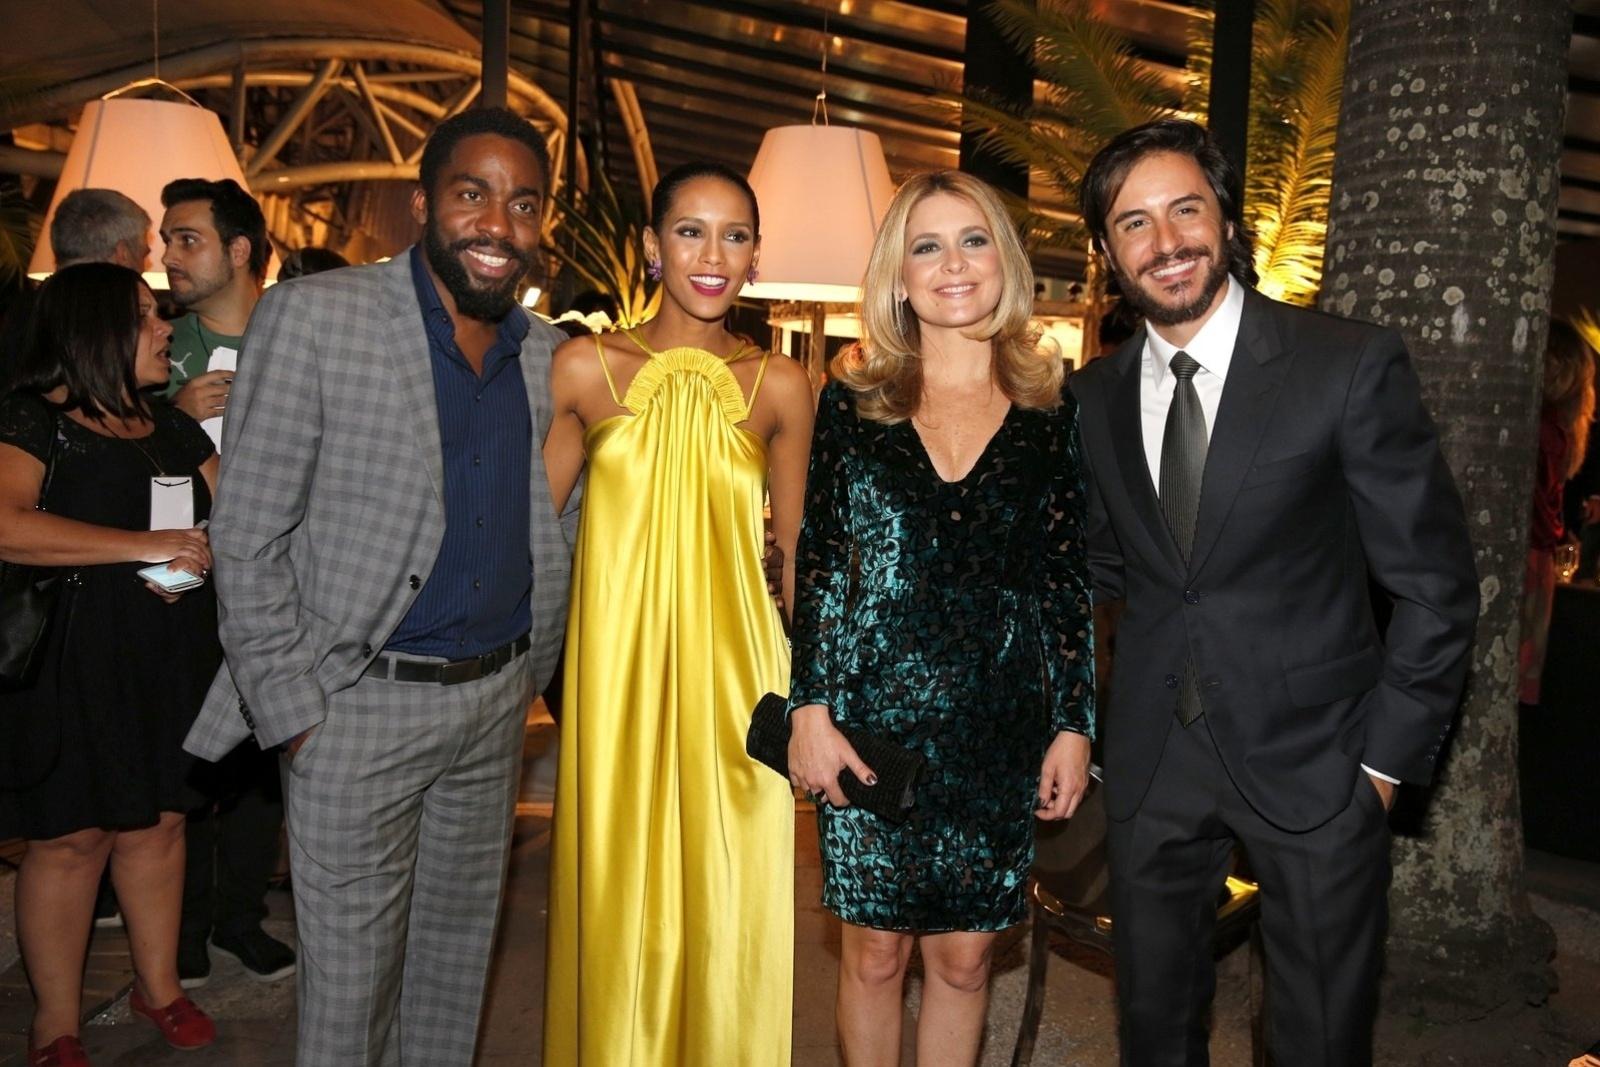 29.abr.2014 - Lázaro Ramos, Taís Araújo, Cláudia Abreu e Ricardo Tozzi posam durante a festa de lançamento da novela